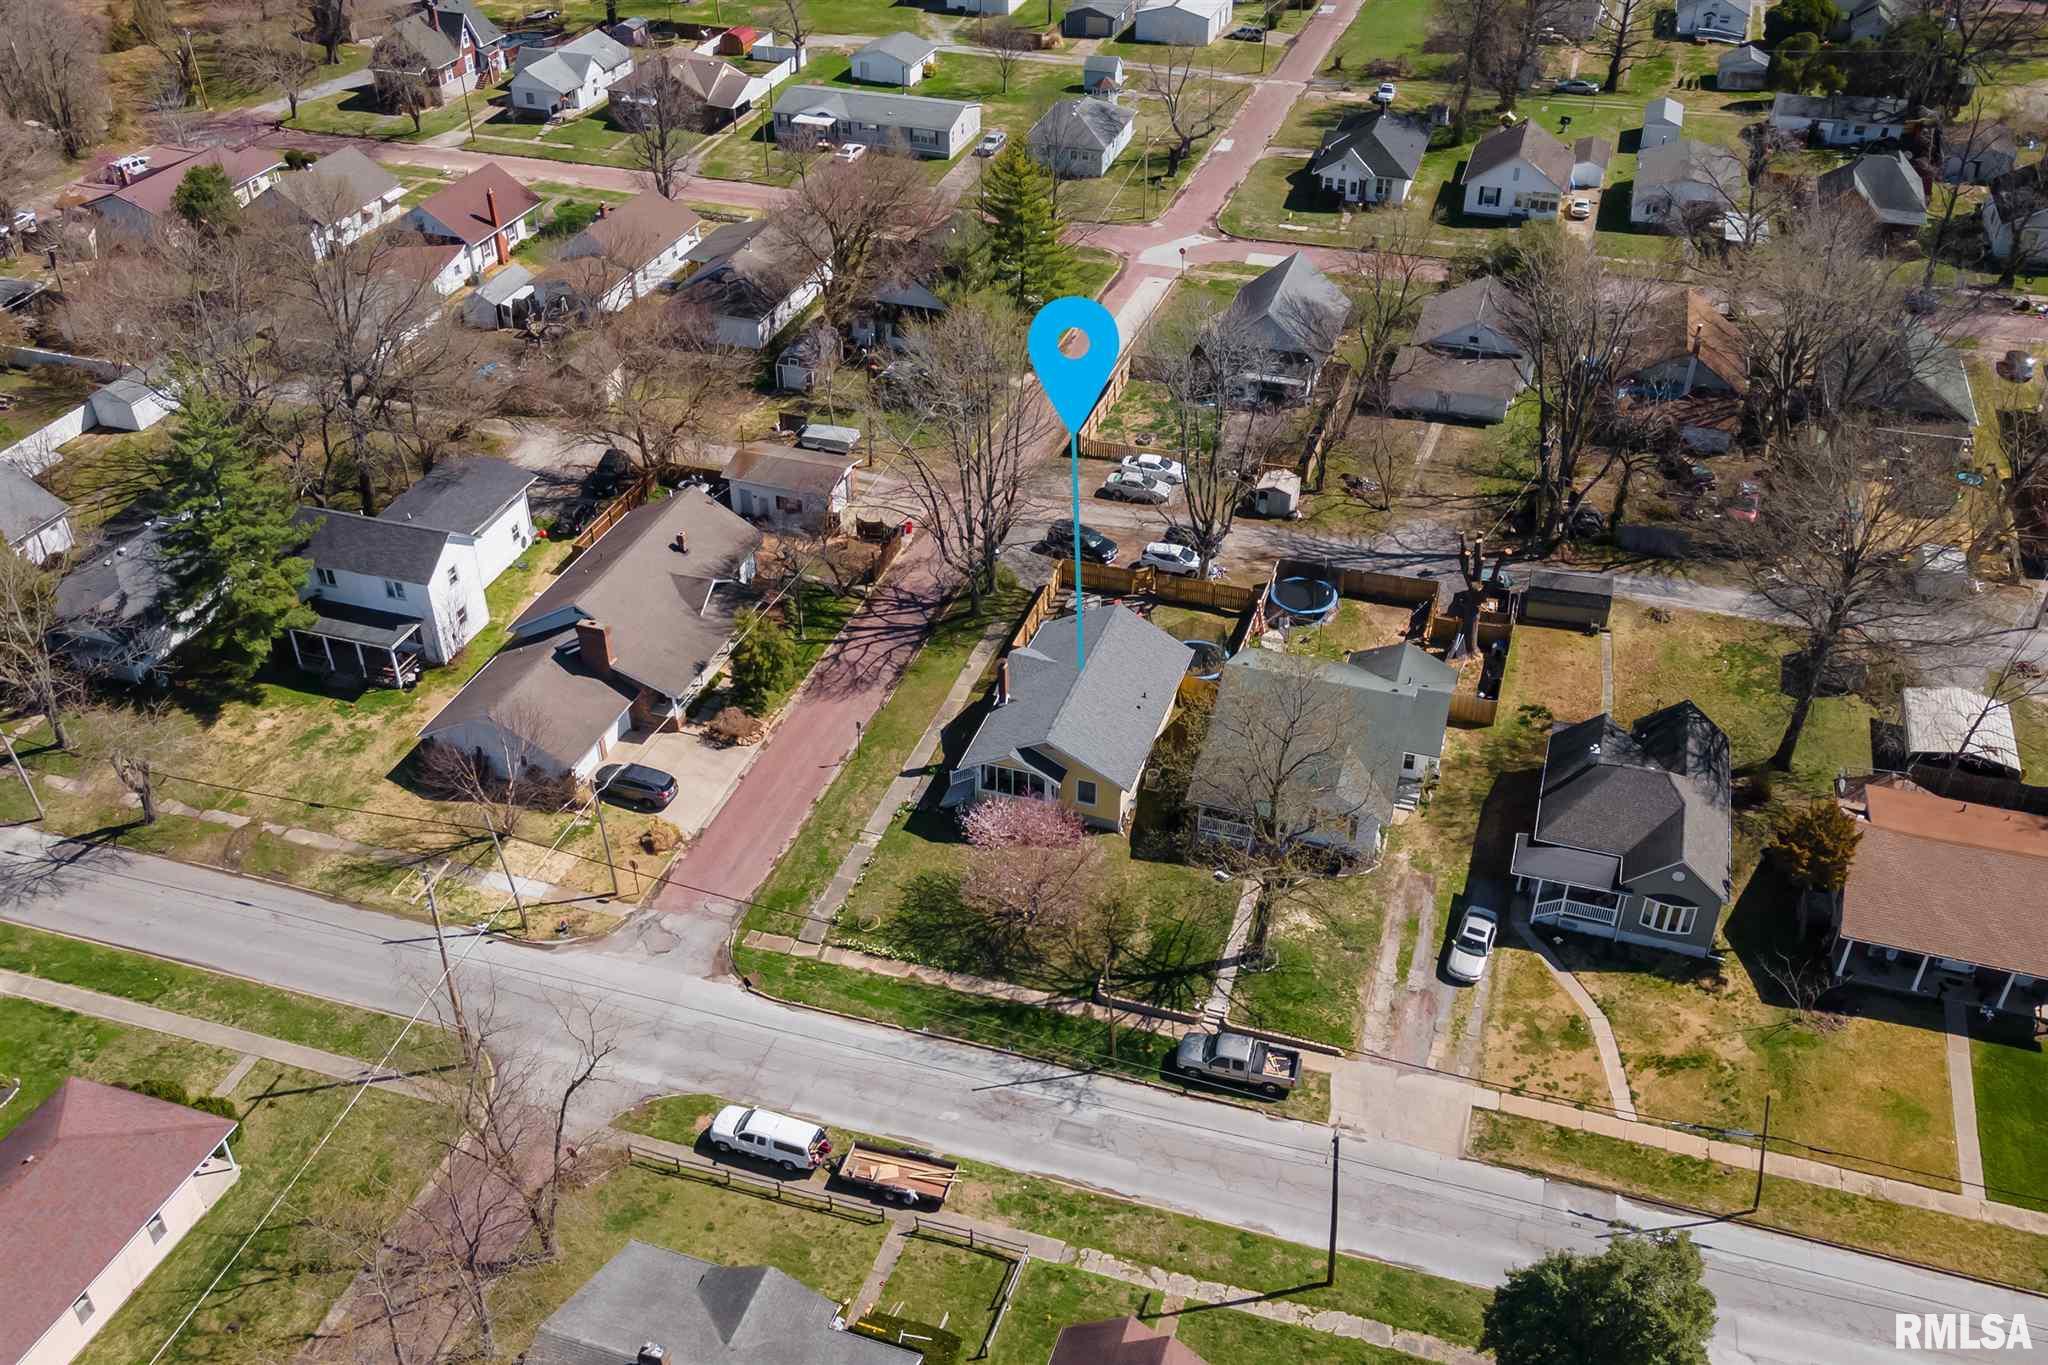 920 N 13TH Street, Herrin, Illinois 62948, 2 Bedrooms Bedrooms, ,1 BathroomBathrooms,Single Family,For Sale,920 N 13TH Street,EB438752